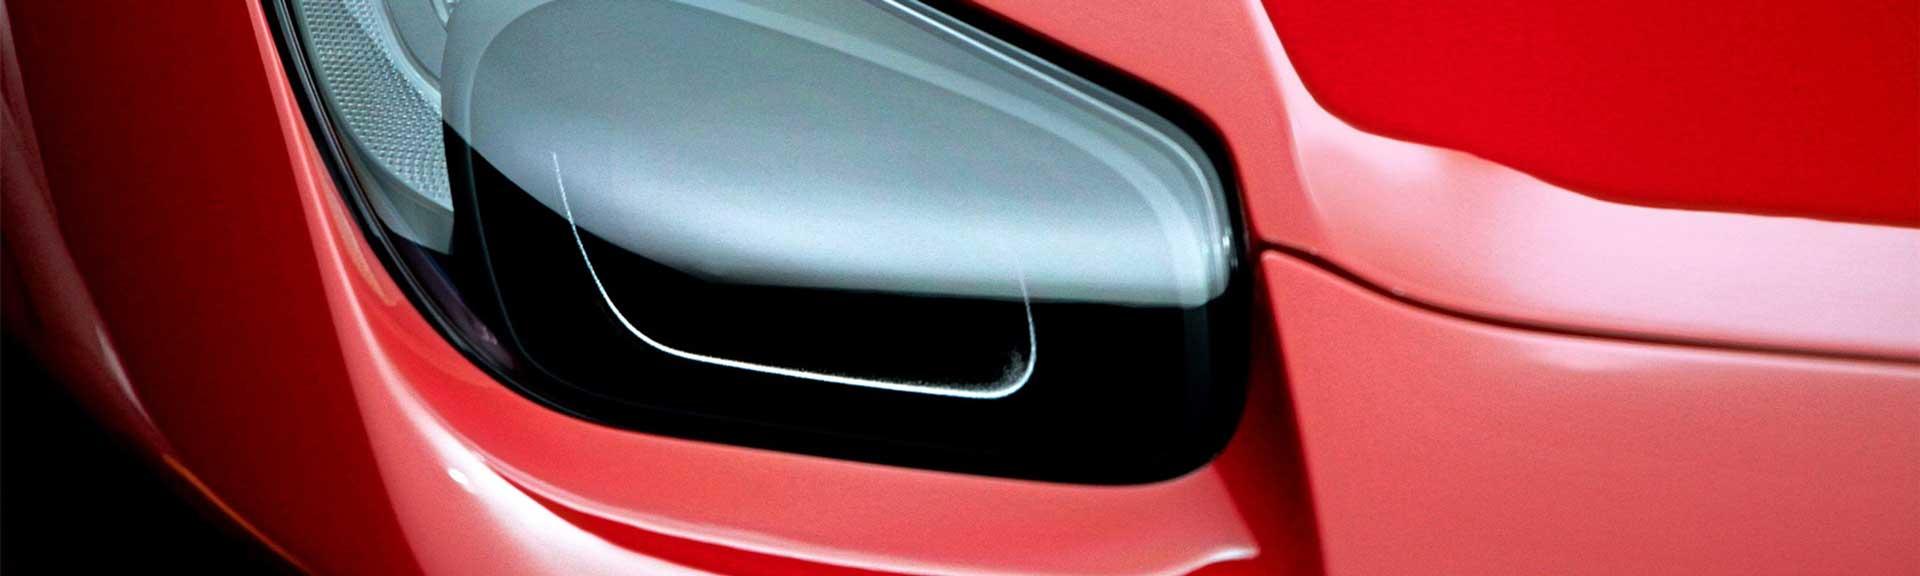 Achat de voiture en Suisse | 076 4 888 000